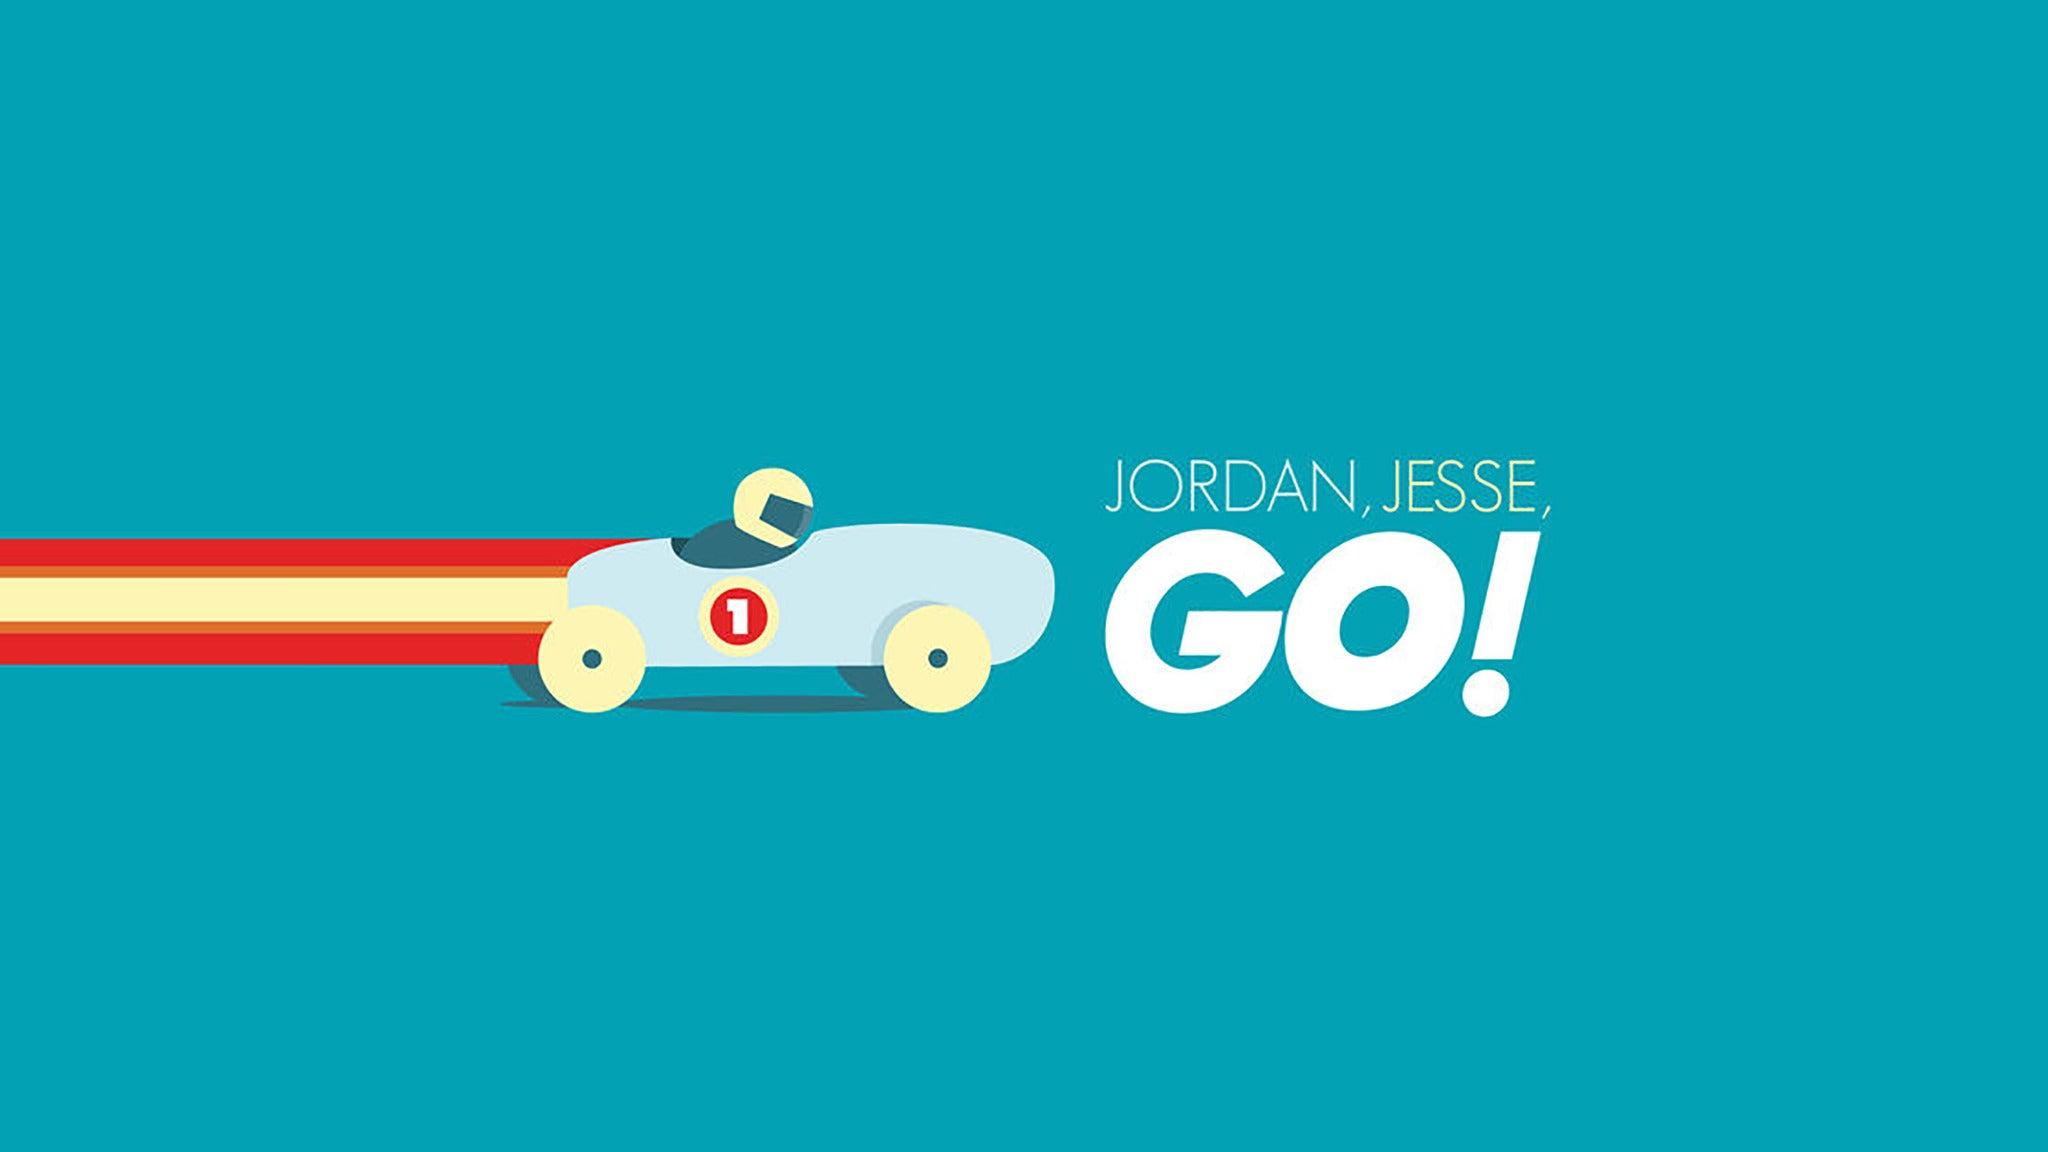 Jordan, Jesse, Go! at WBUR CitySpace